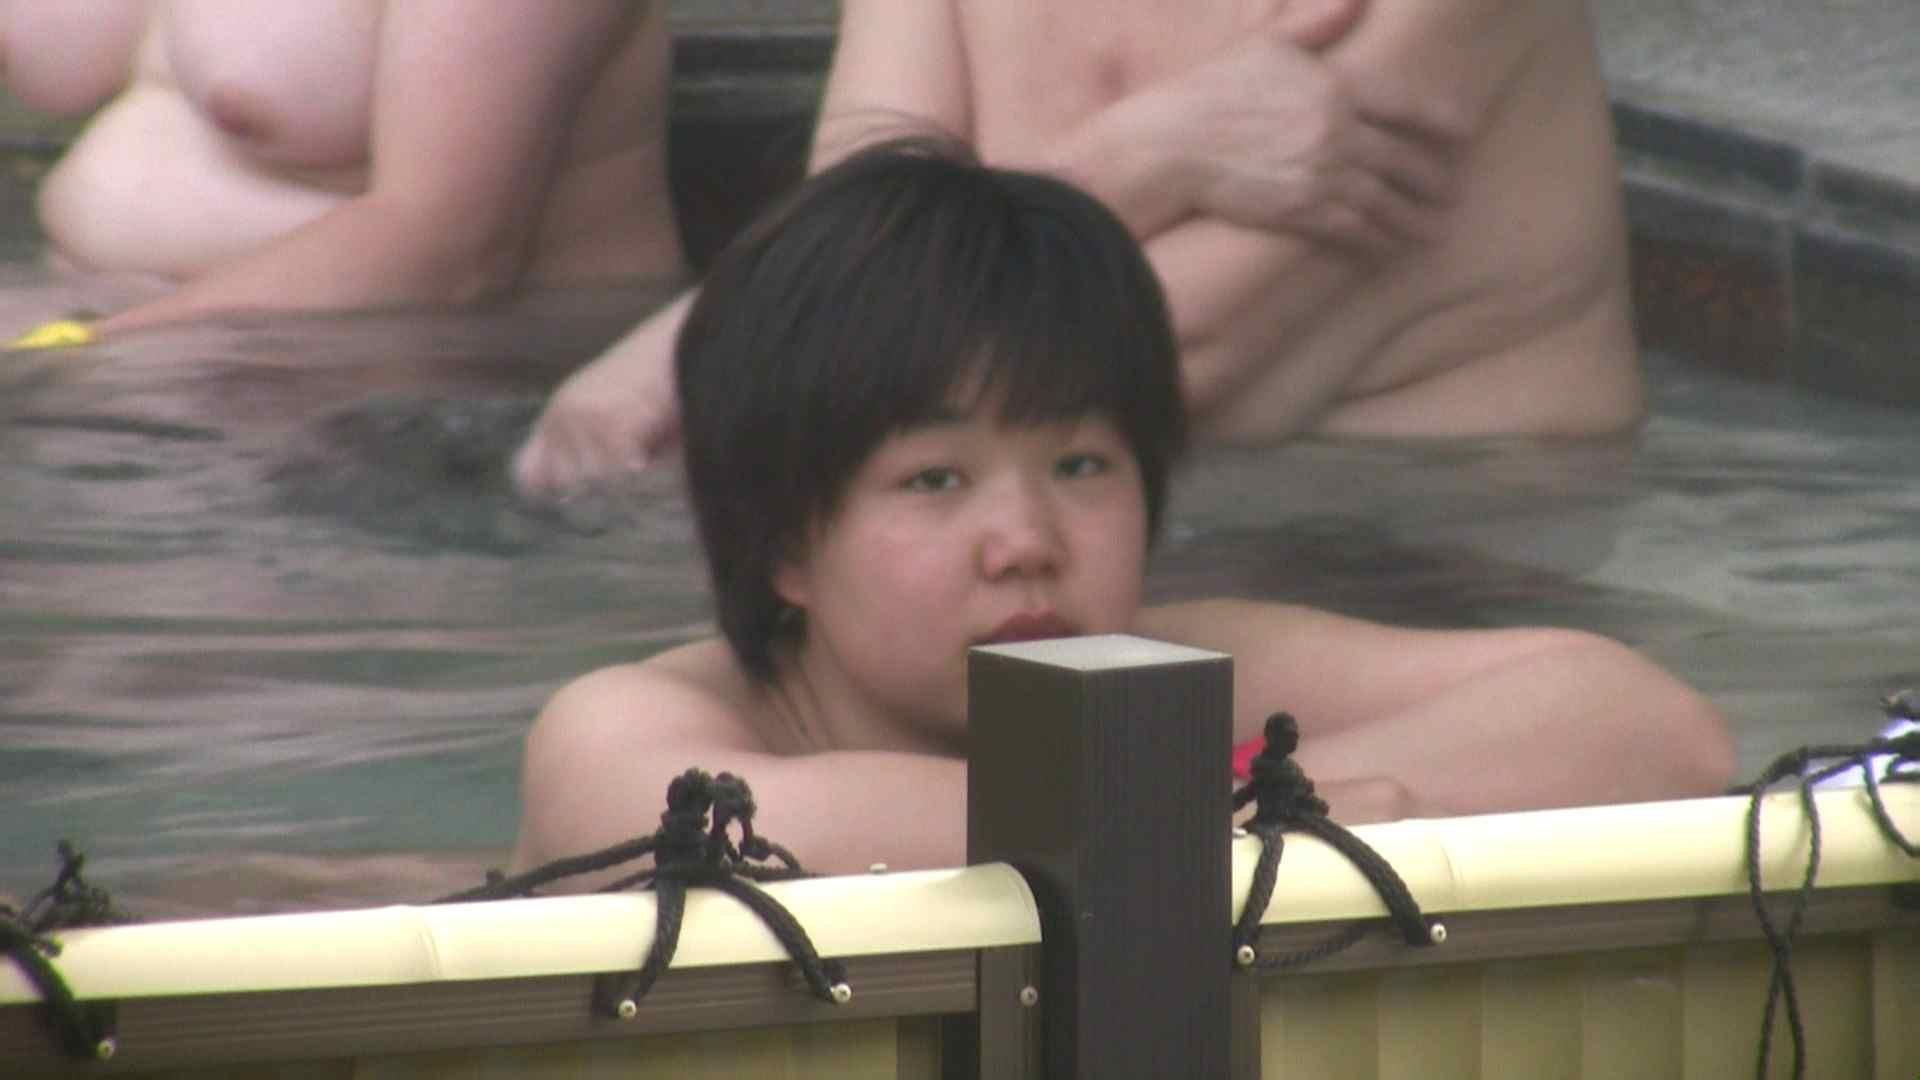 Aquaな露天風呂Vol.53【VIP限定】 女体盗撮 | OL女体  93連発 61